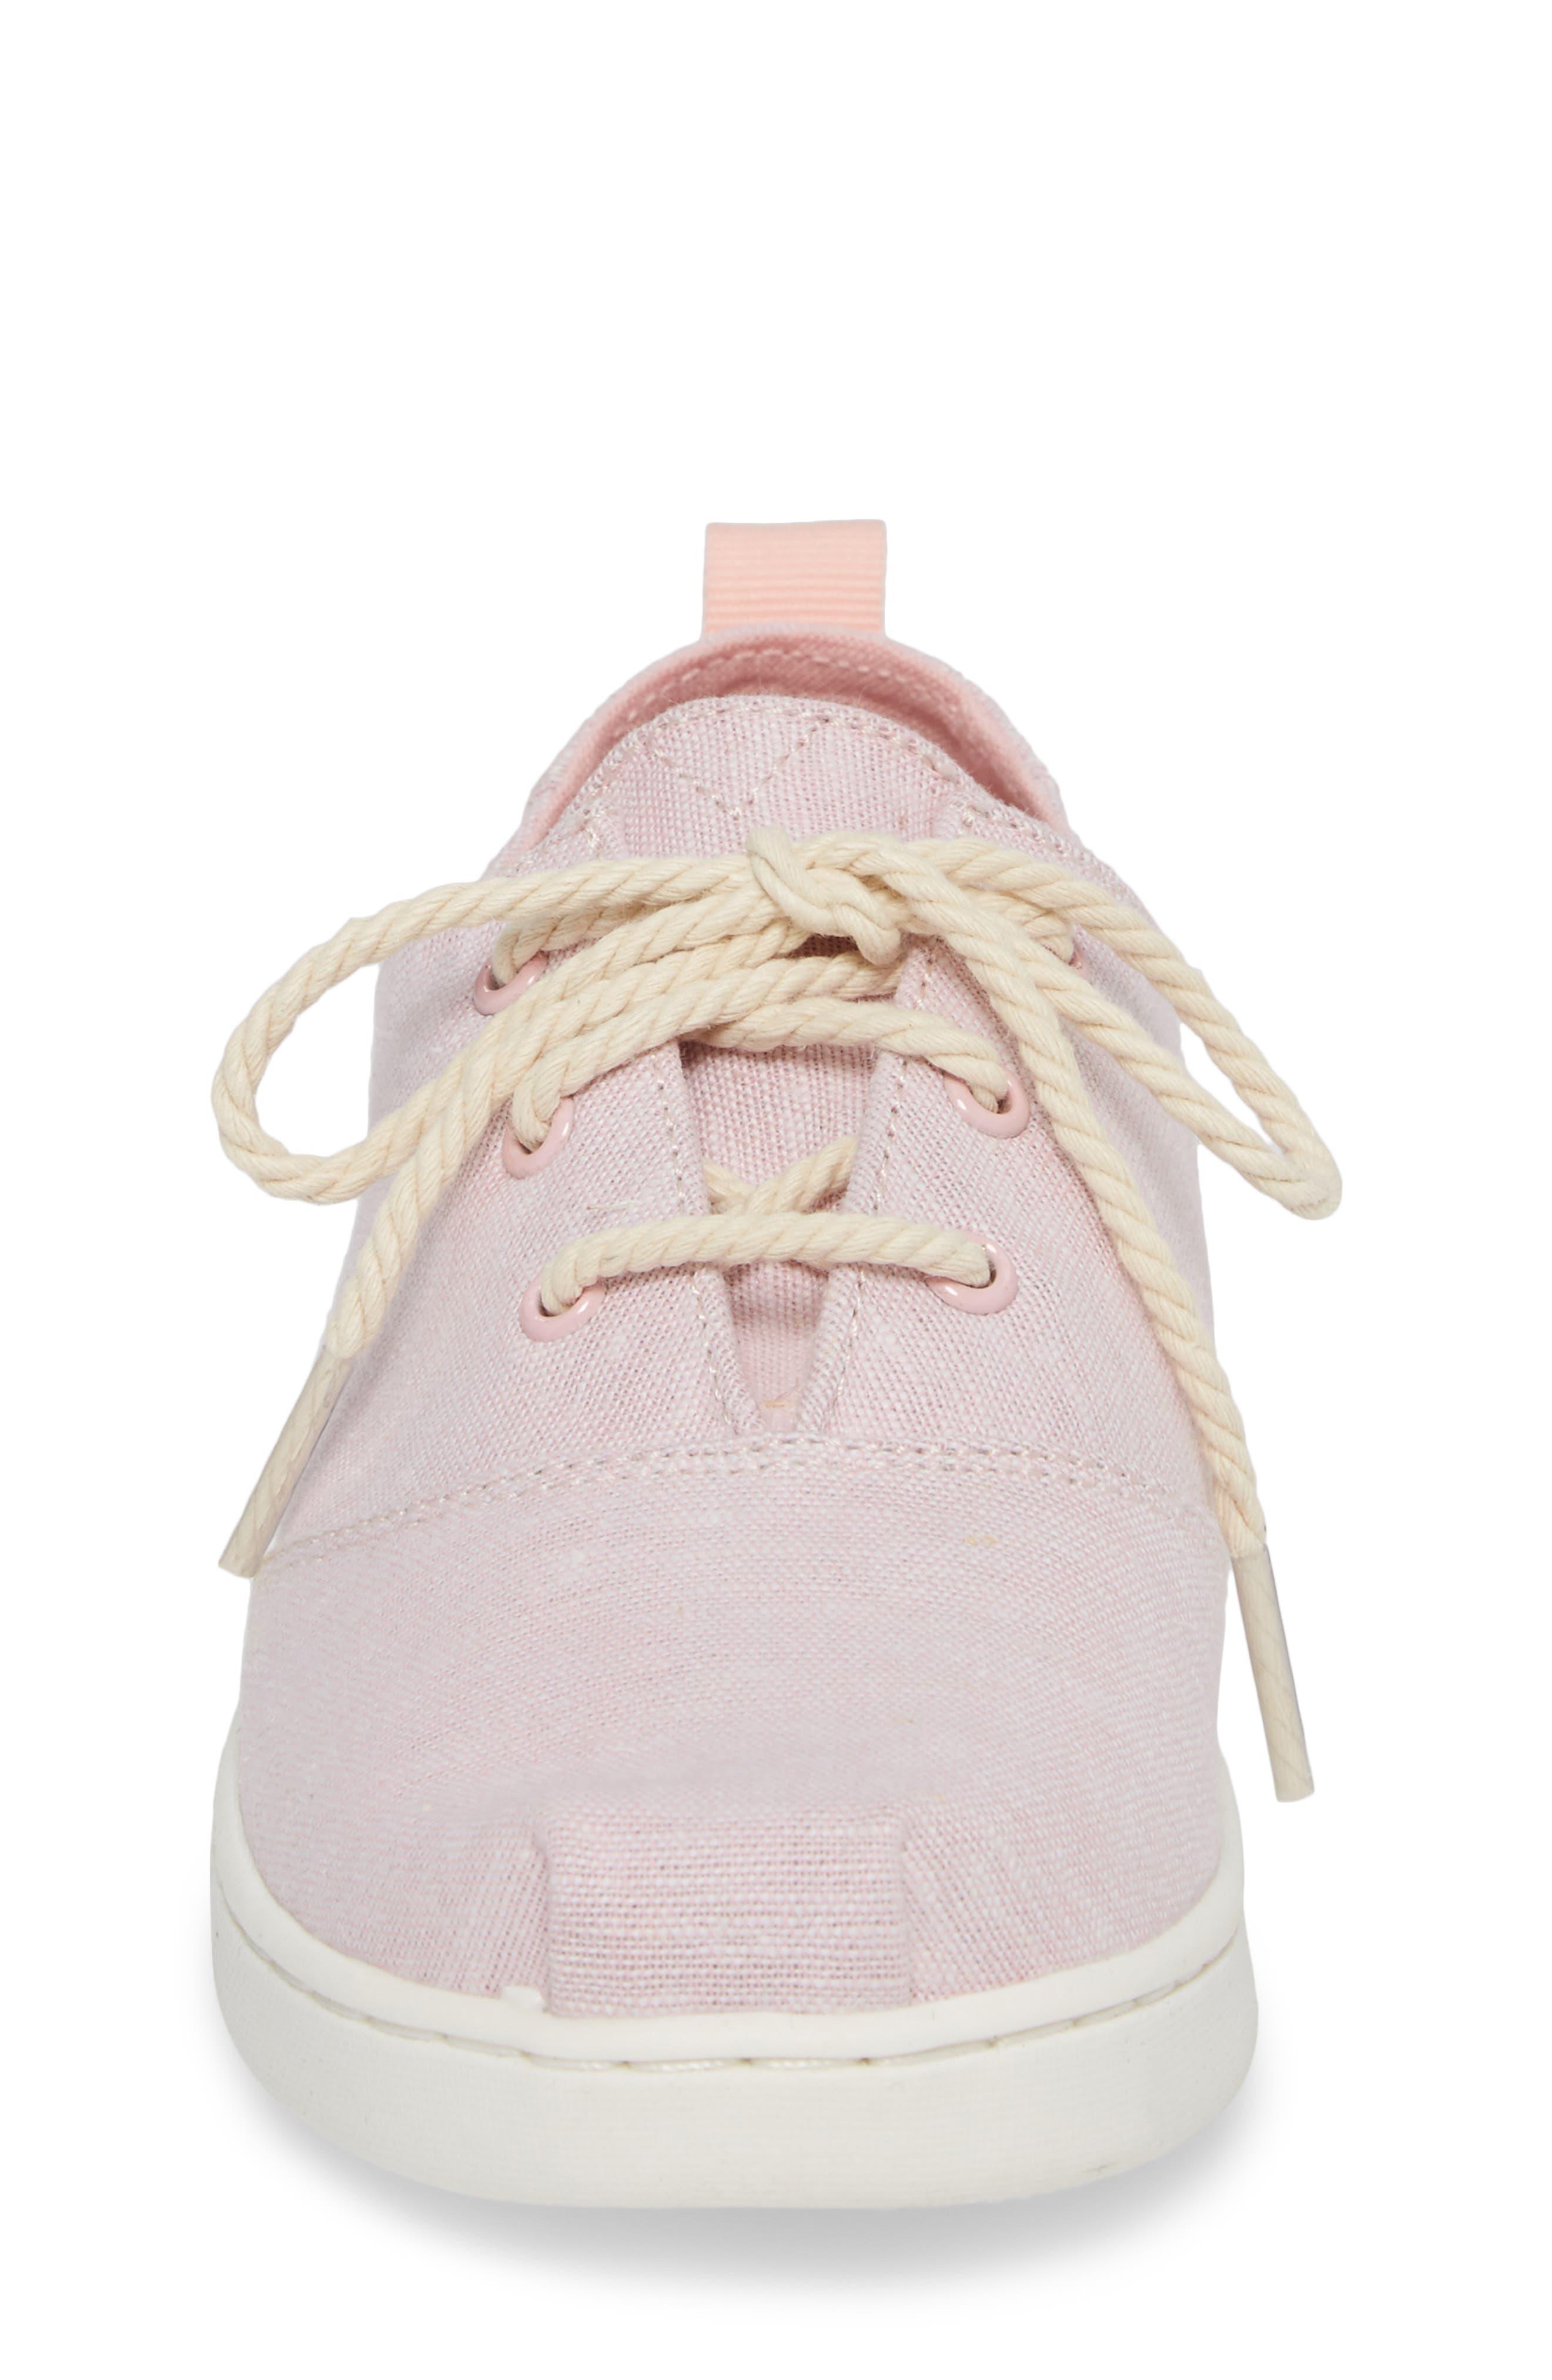 Lumin Sneaker,                             Alternate thumbnail 4, color,                             650